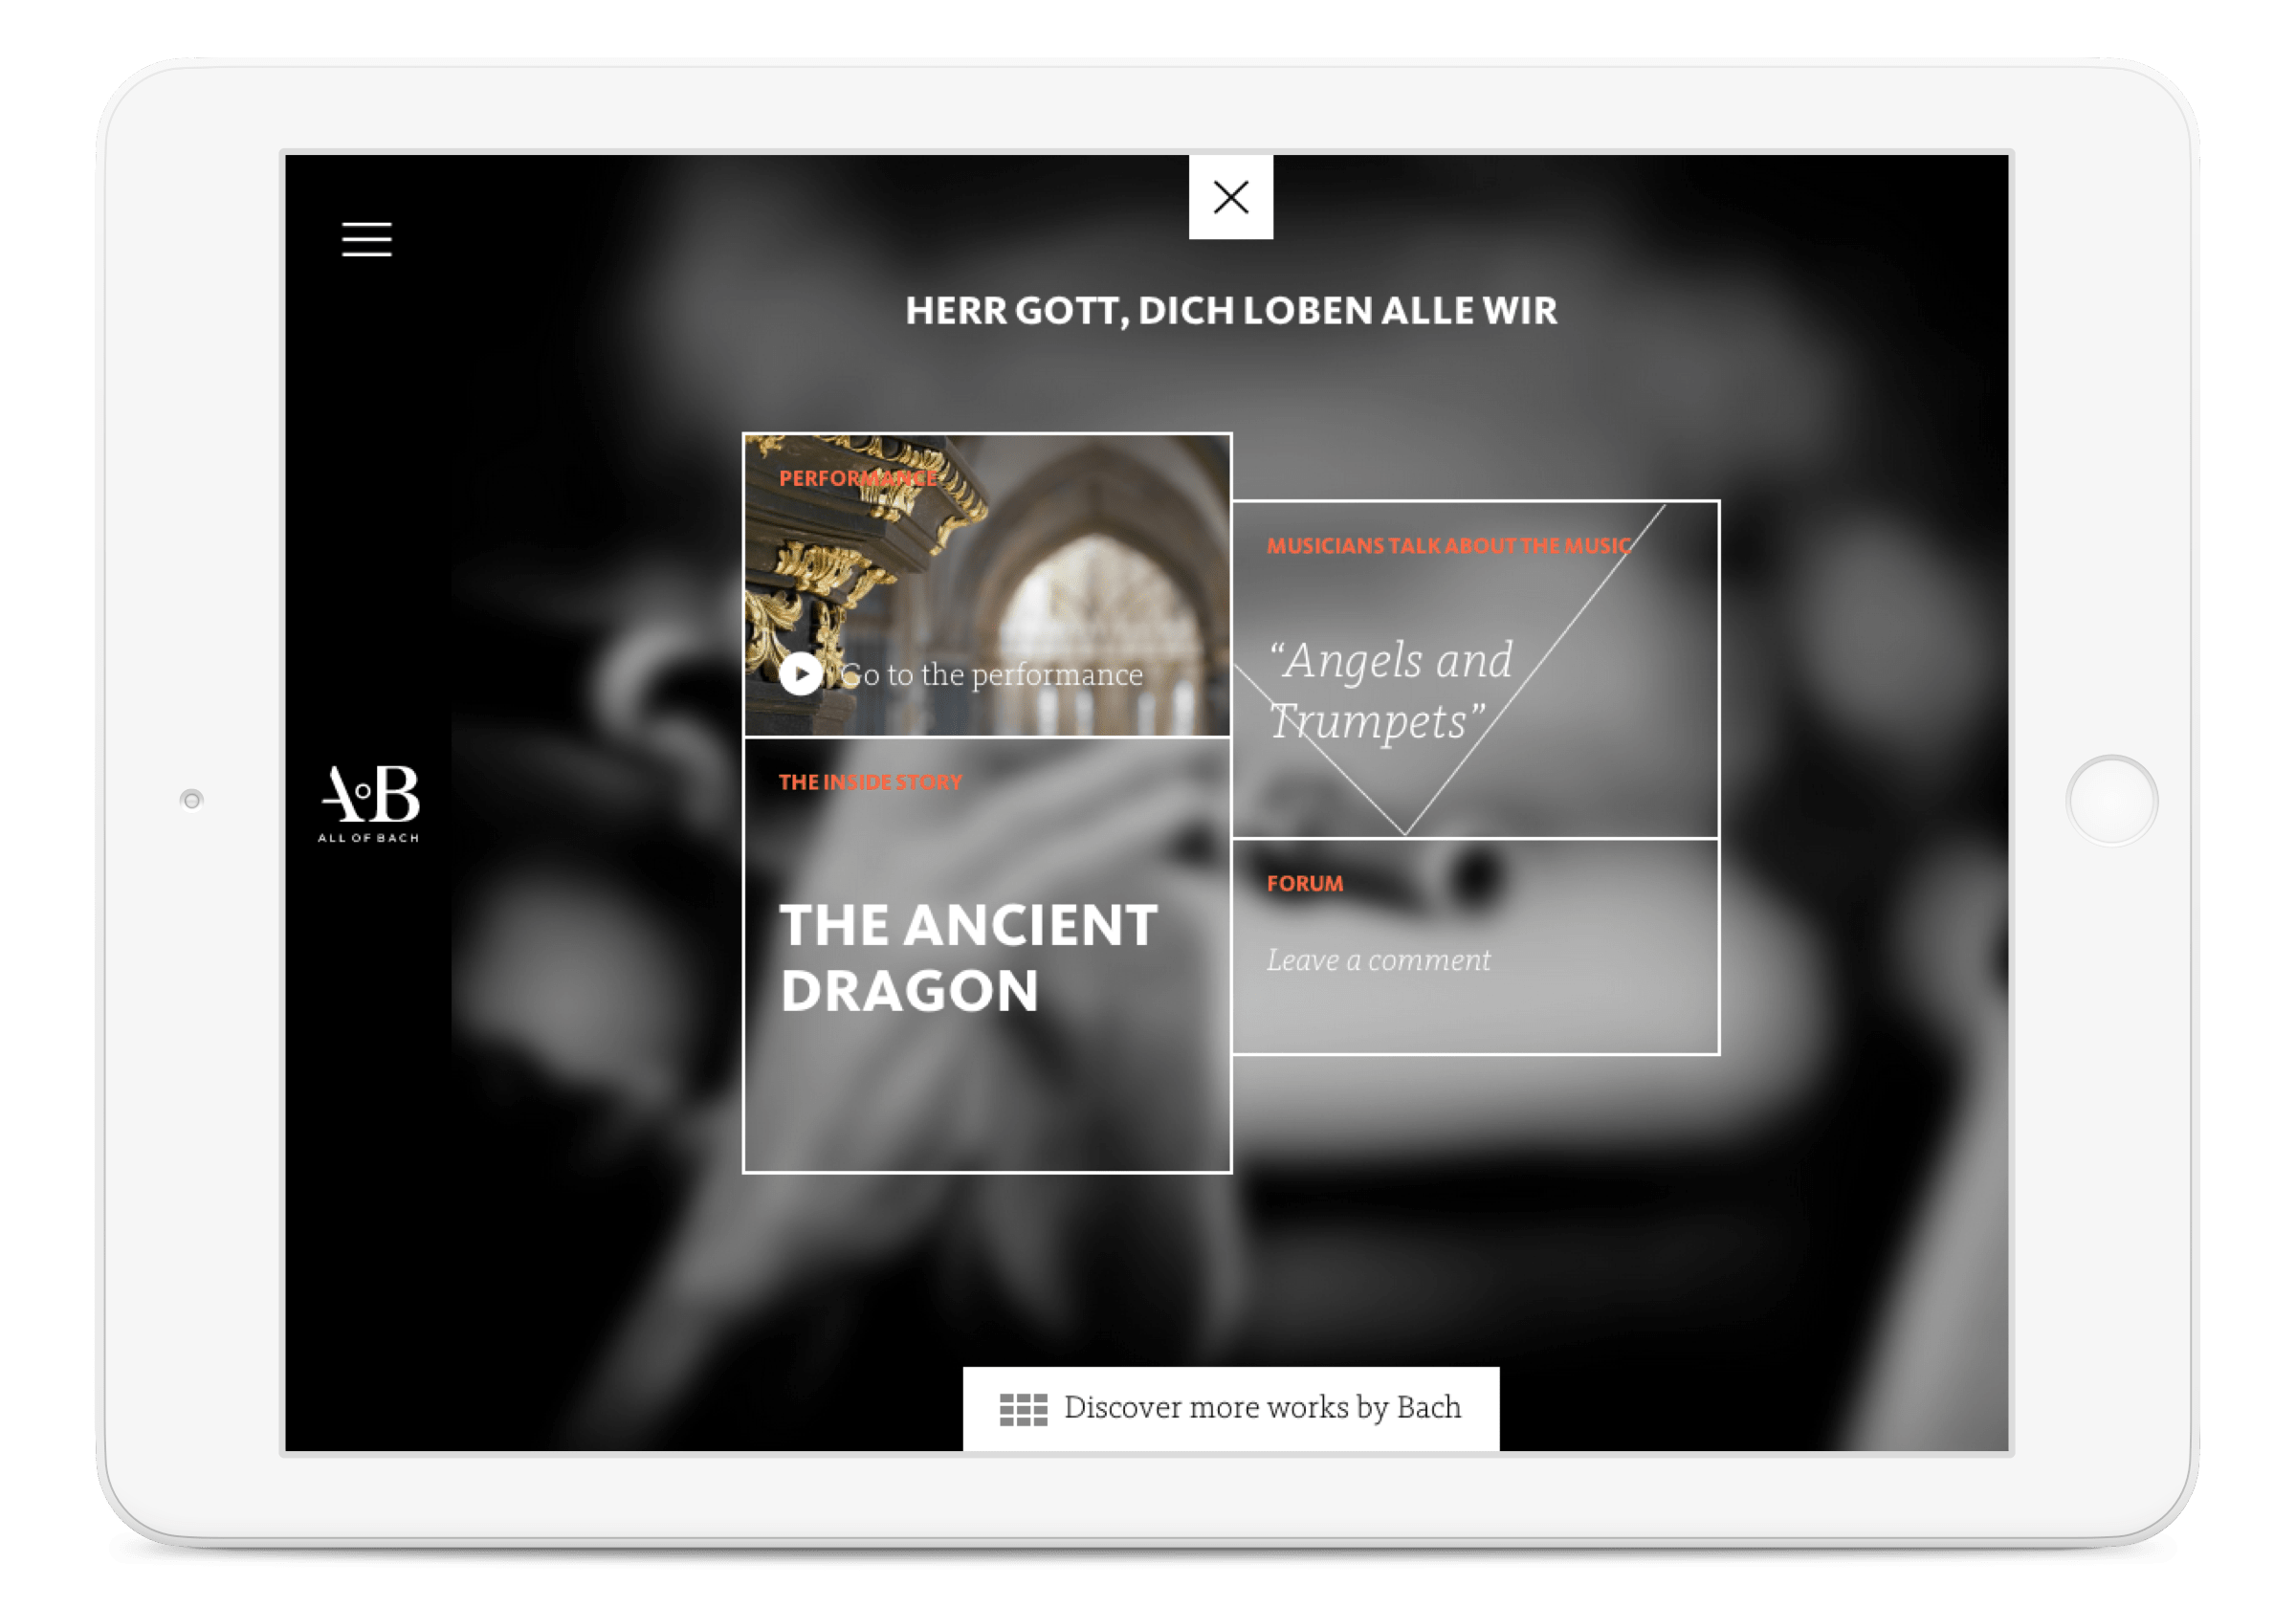 All of Bach website, edition menu